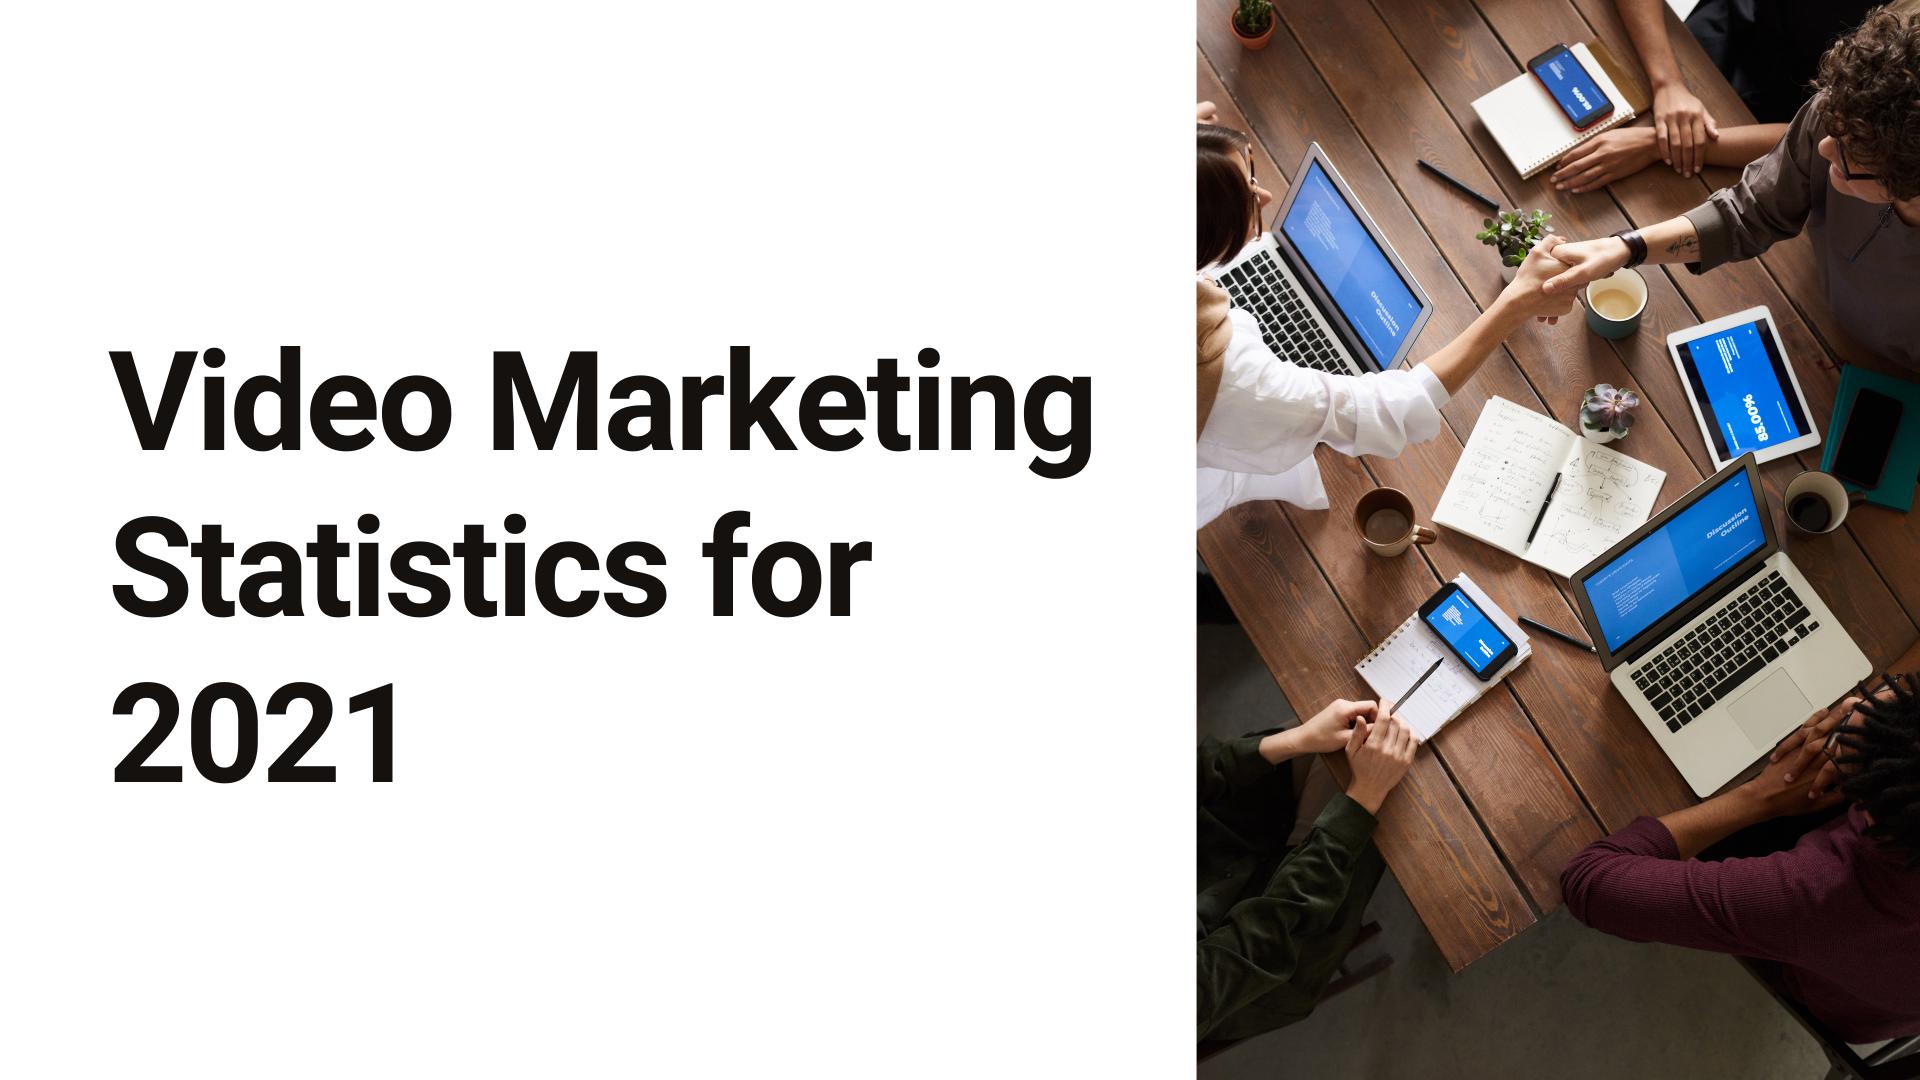 Video Marketing Statistics 2021